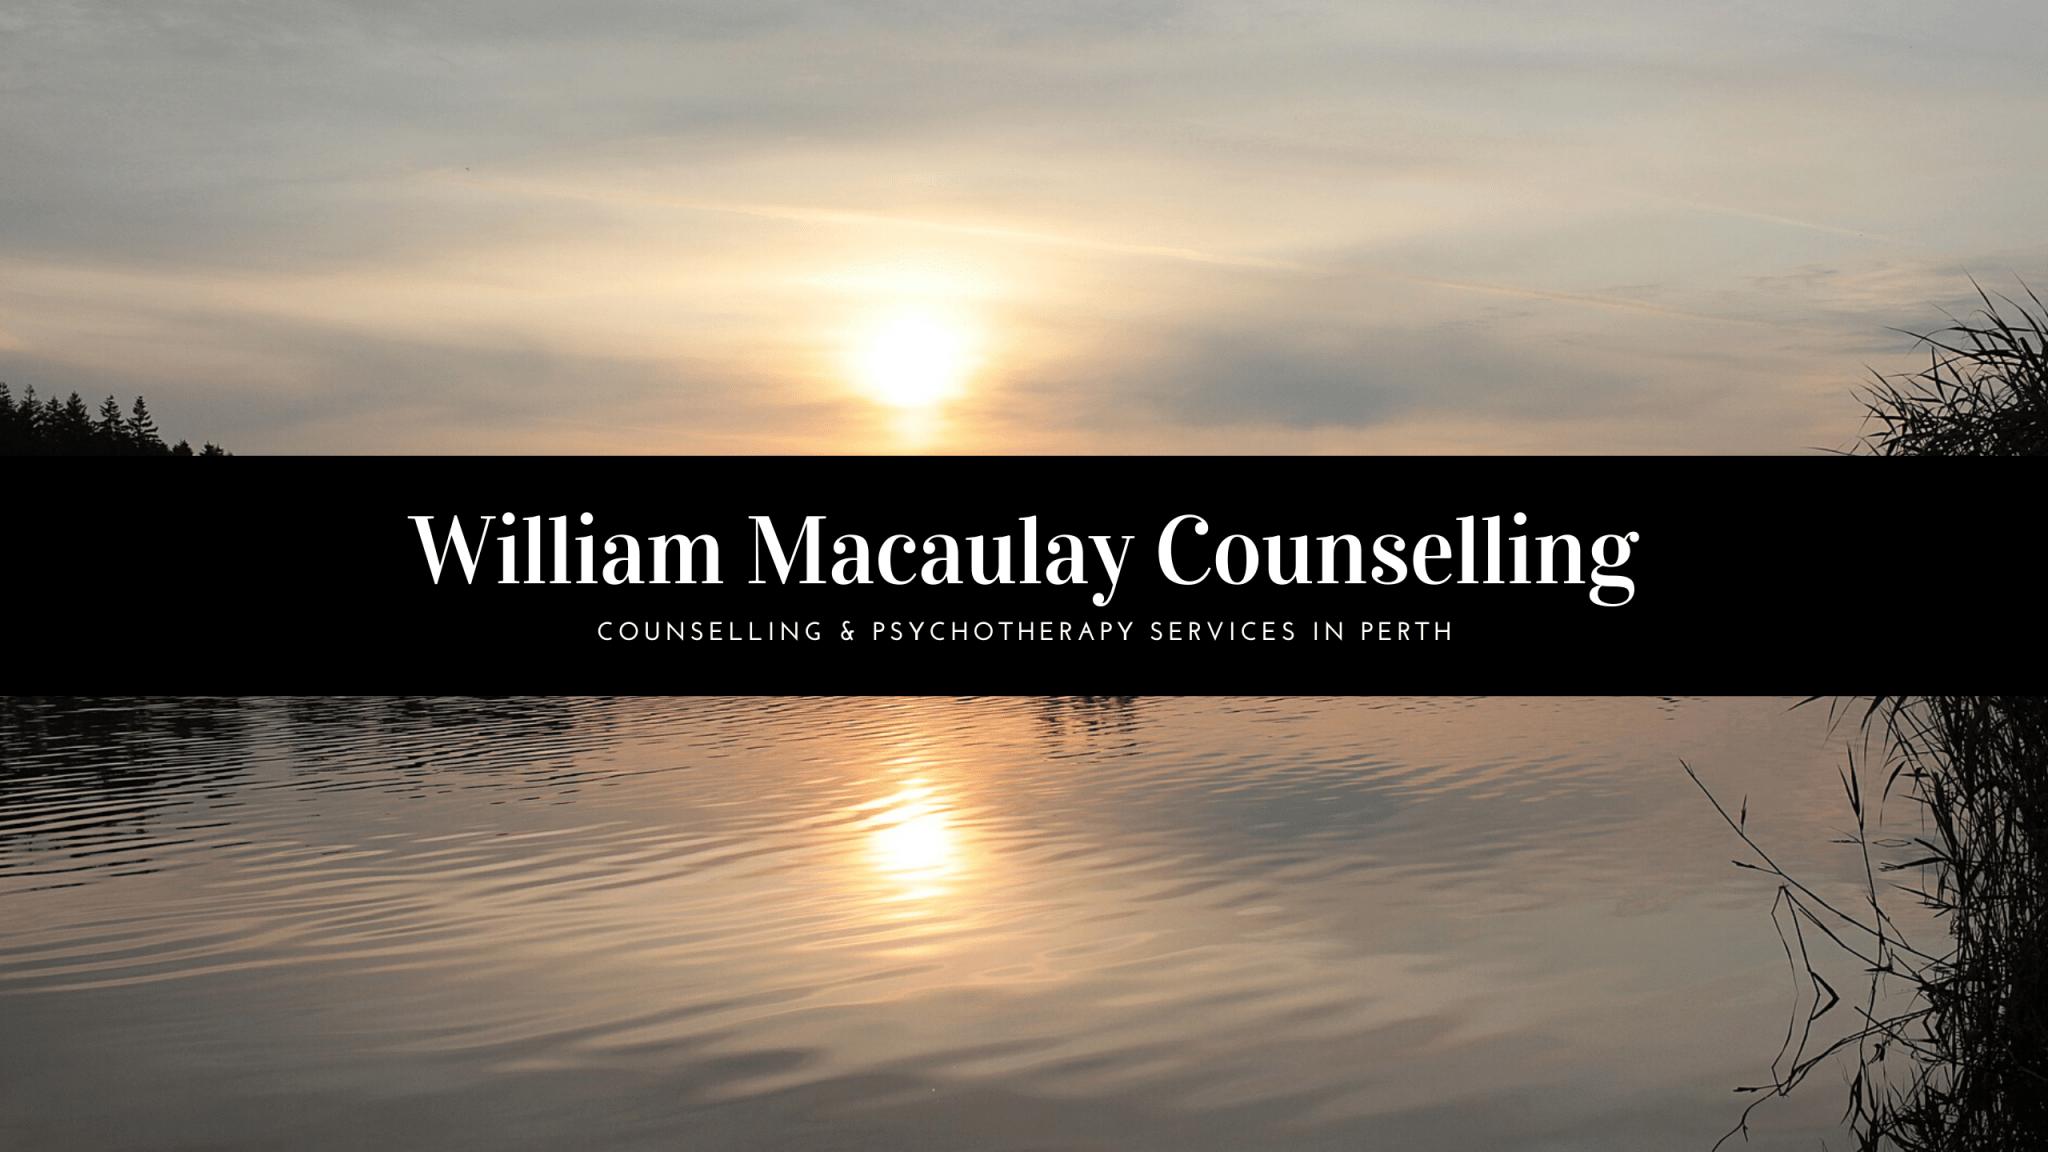 William Macaulay Counselling Perth